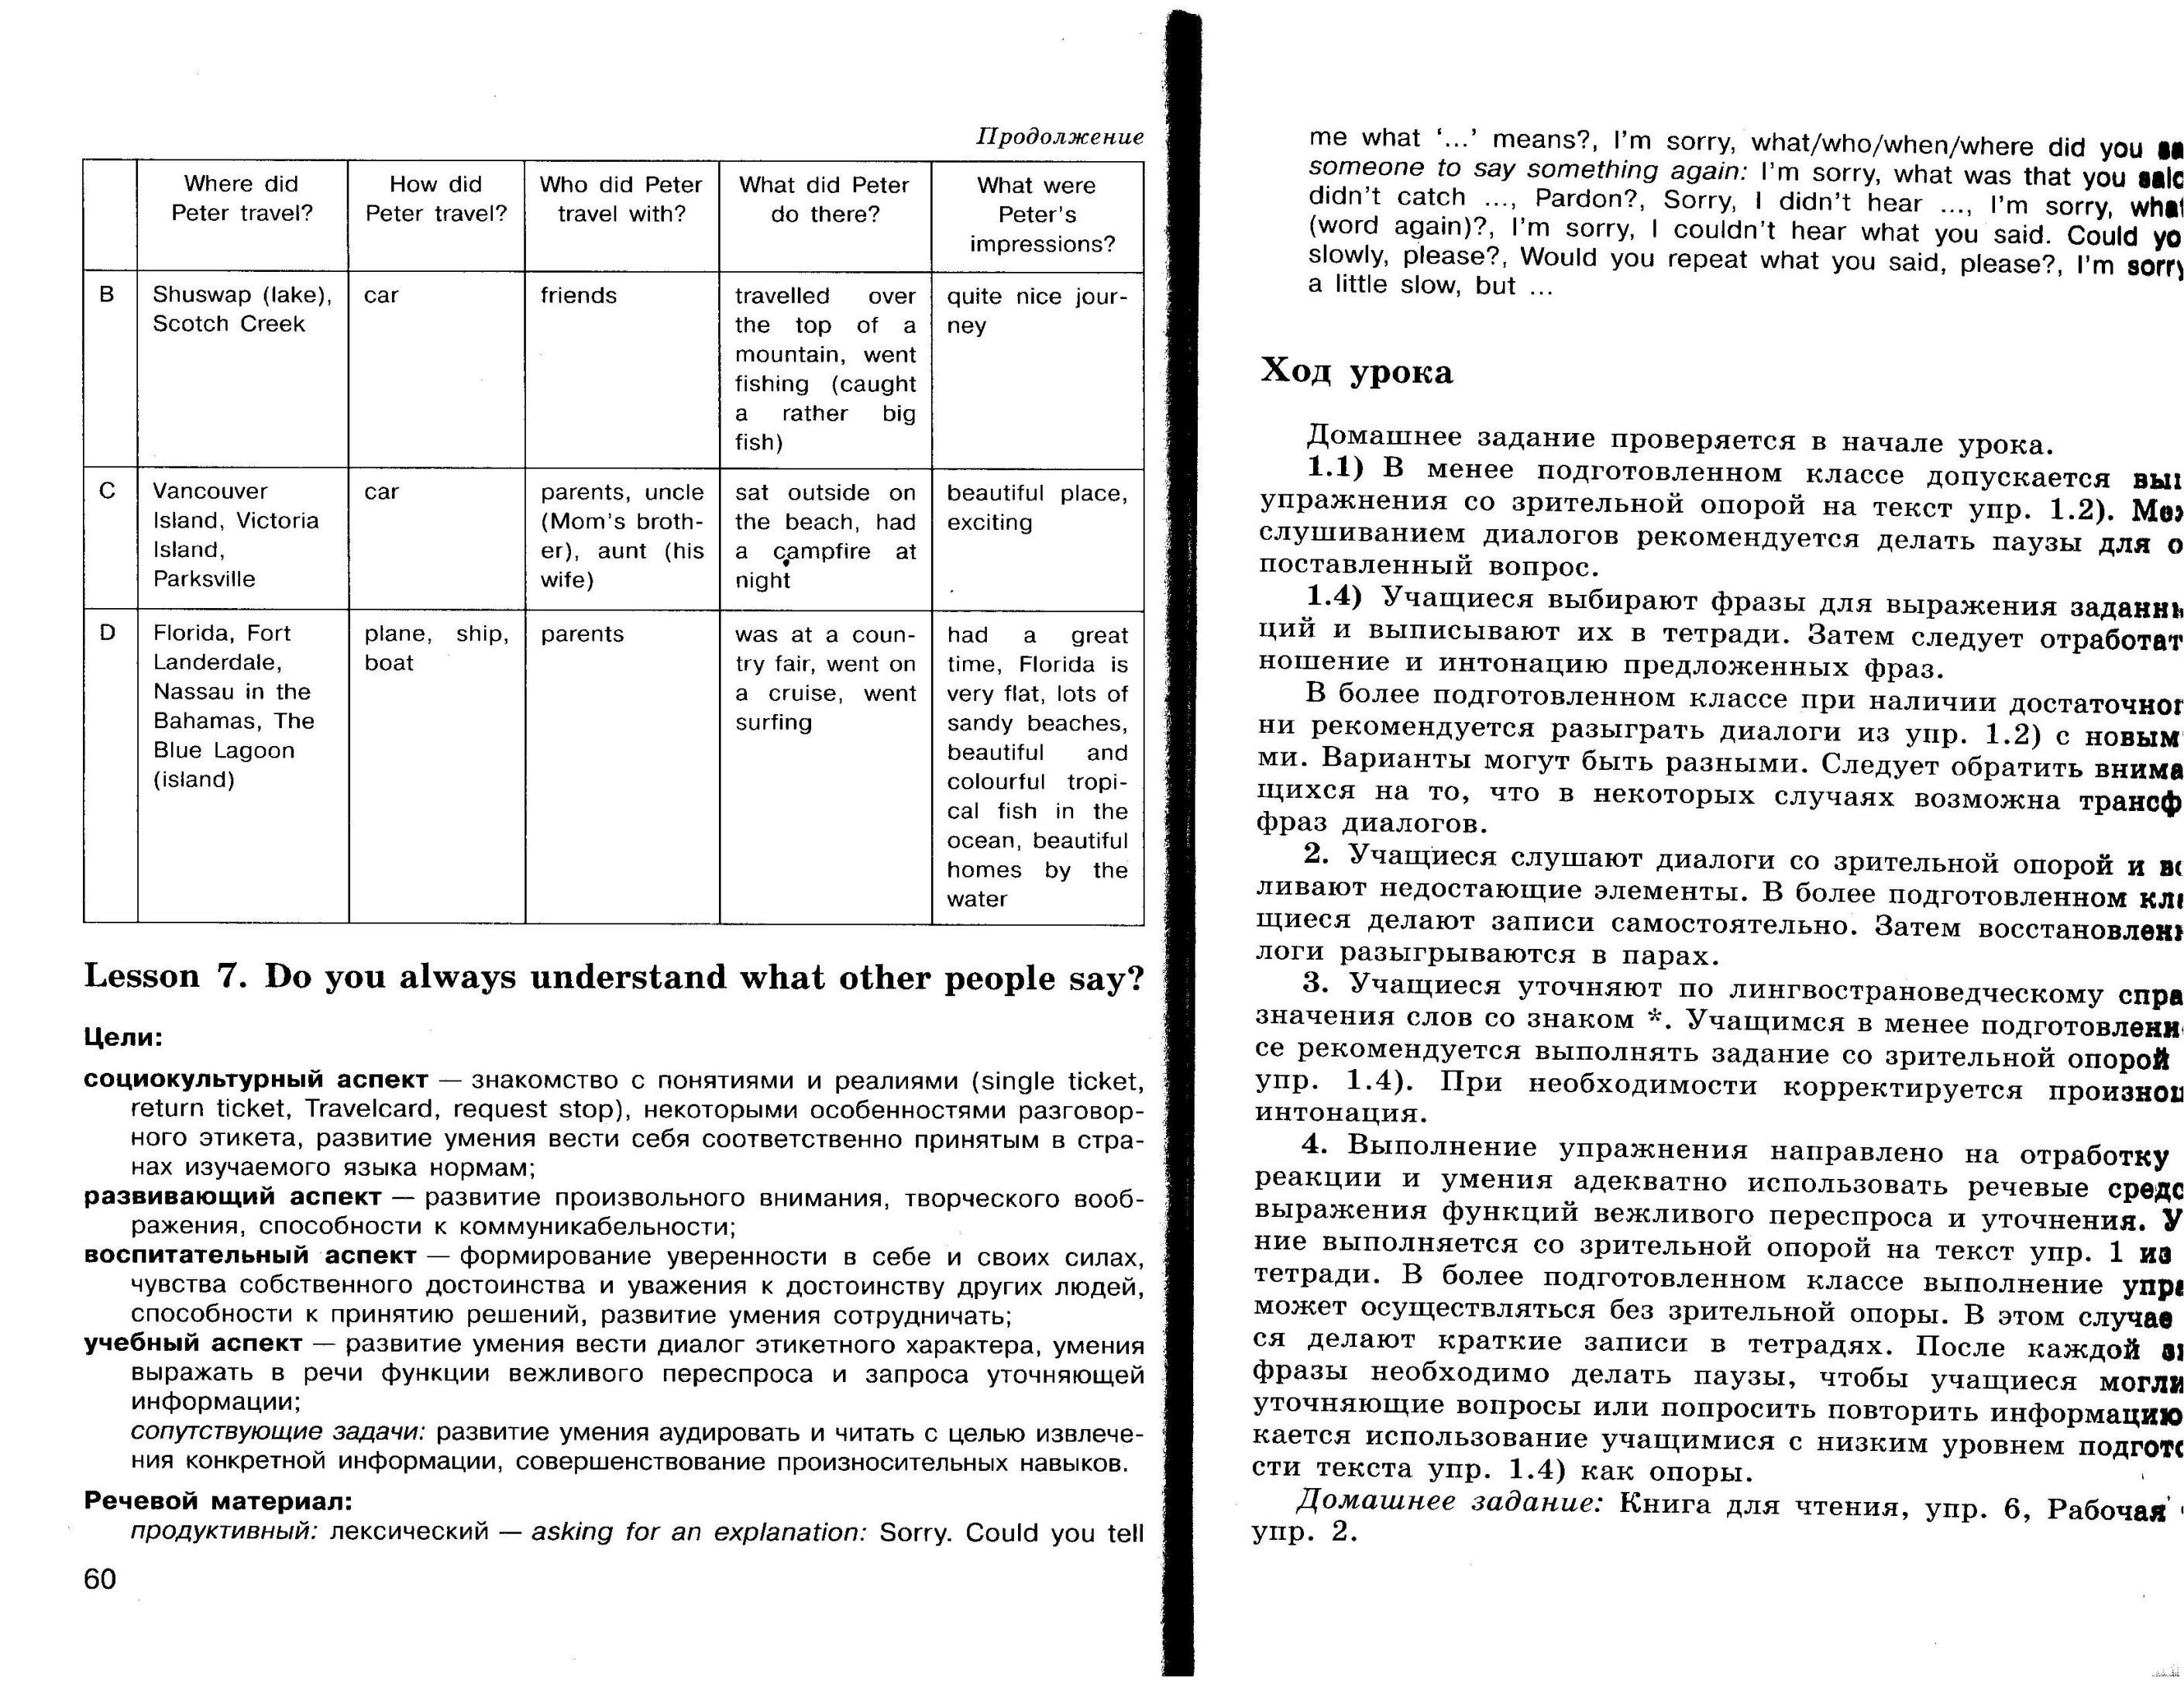 C:\Users\Грузиновская СОШ\Documents\Scanned Documents\Рисунок (1535).jpg